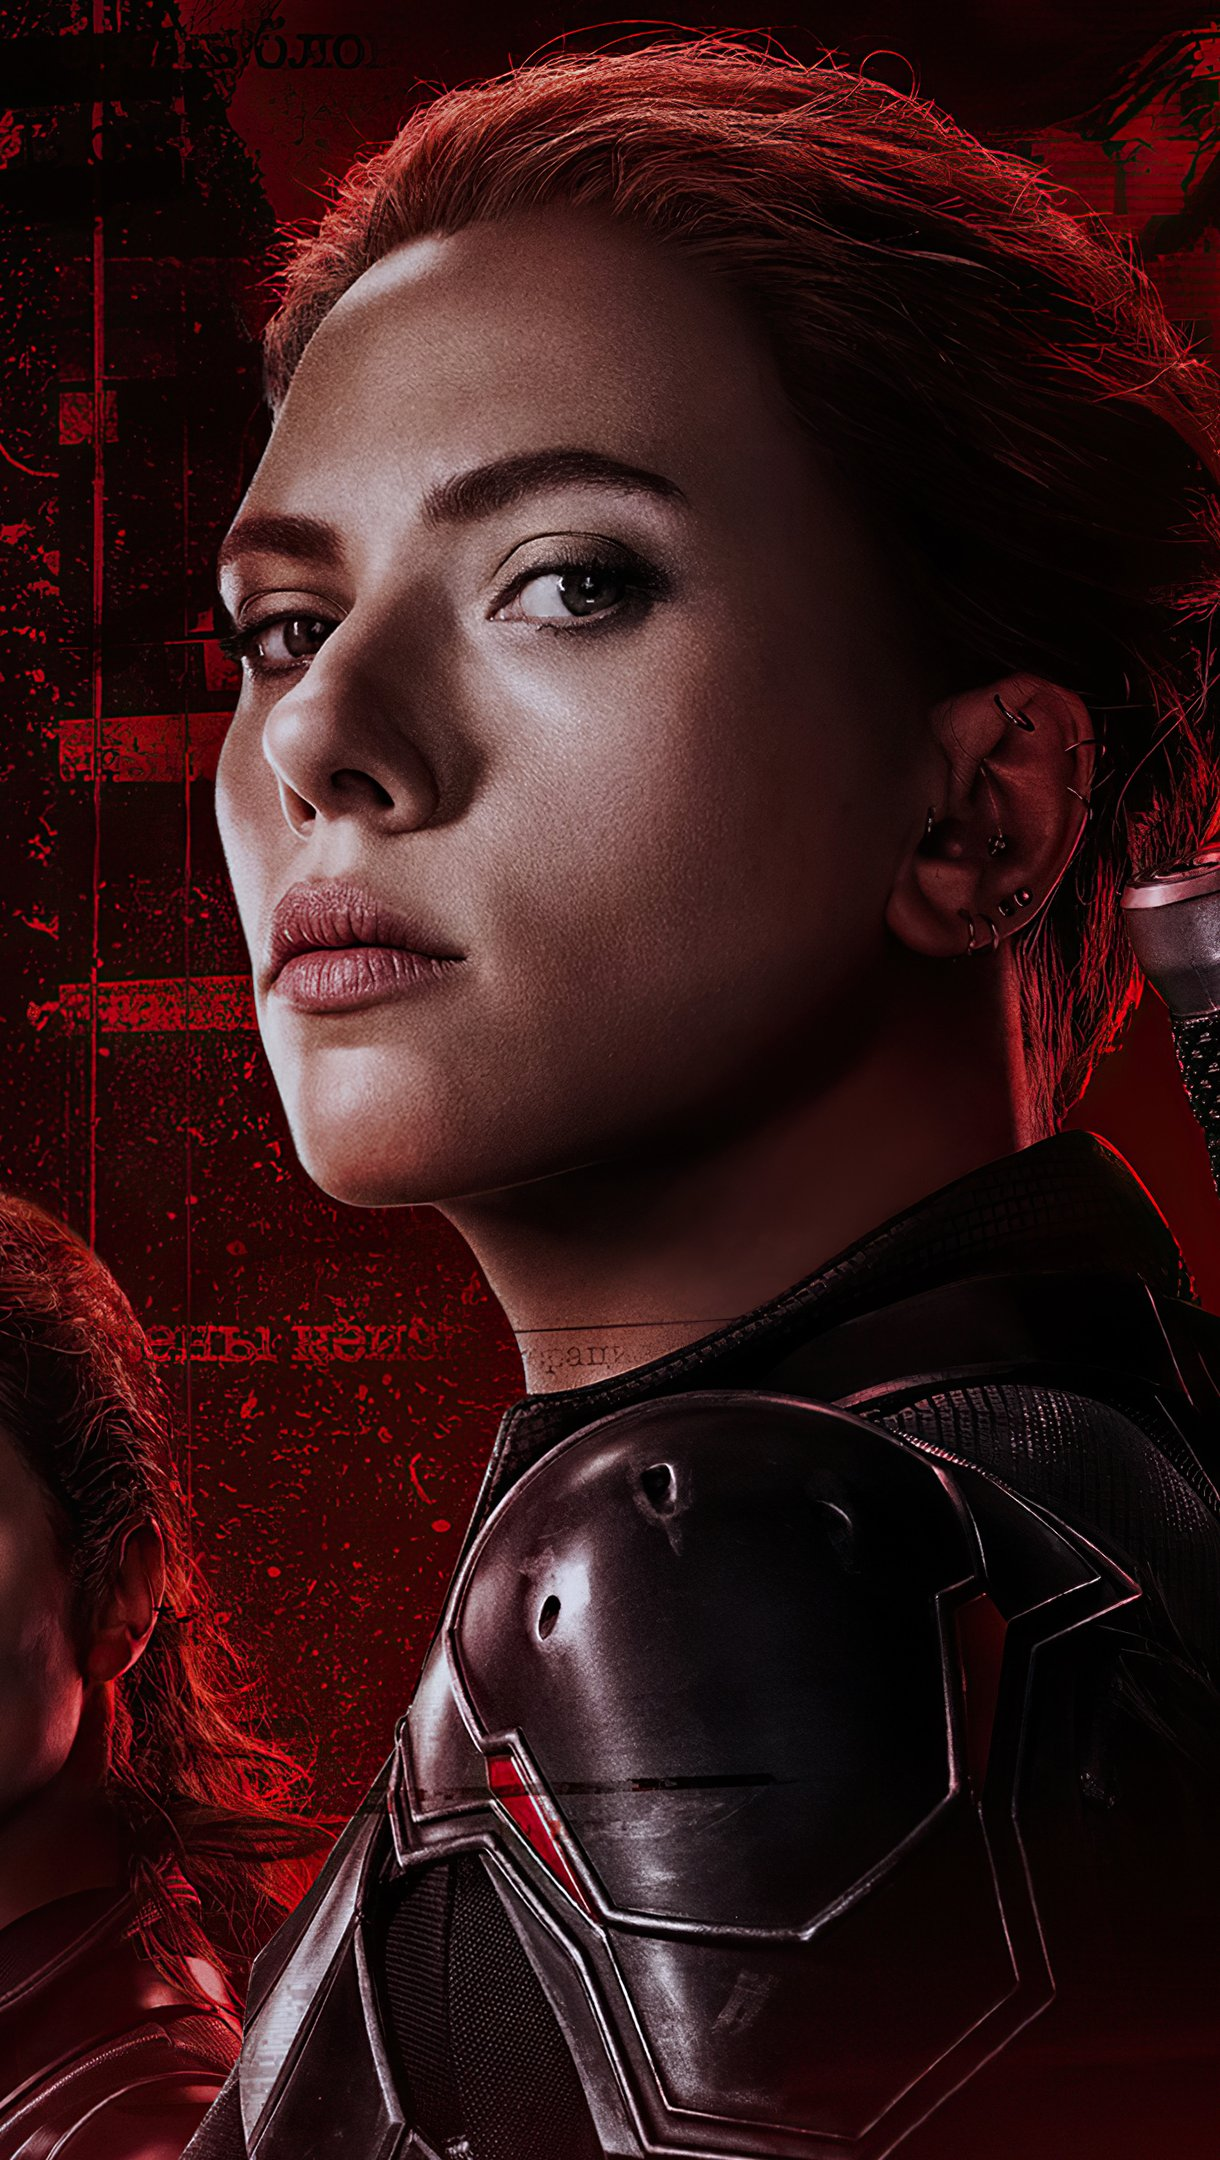 Wallpaper Black Widow Movie 2021 Vertical